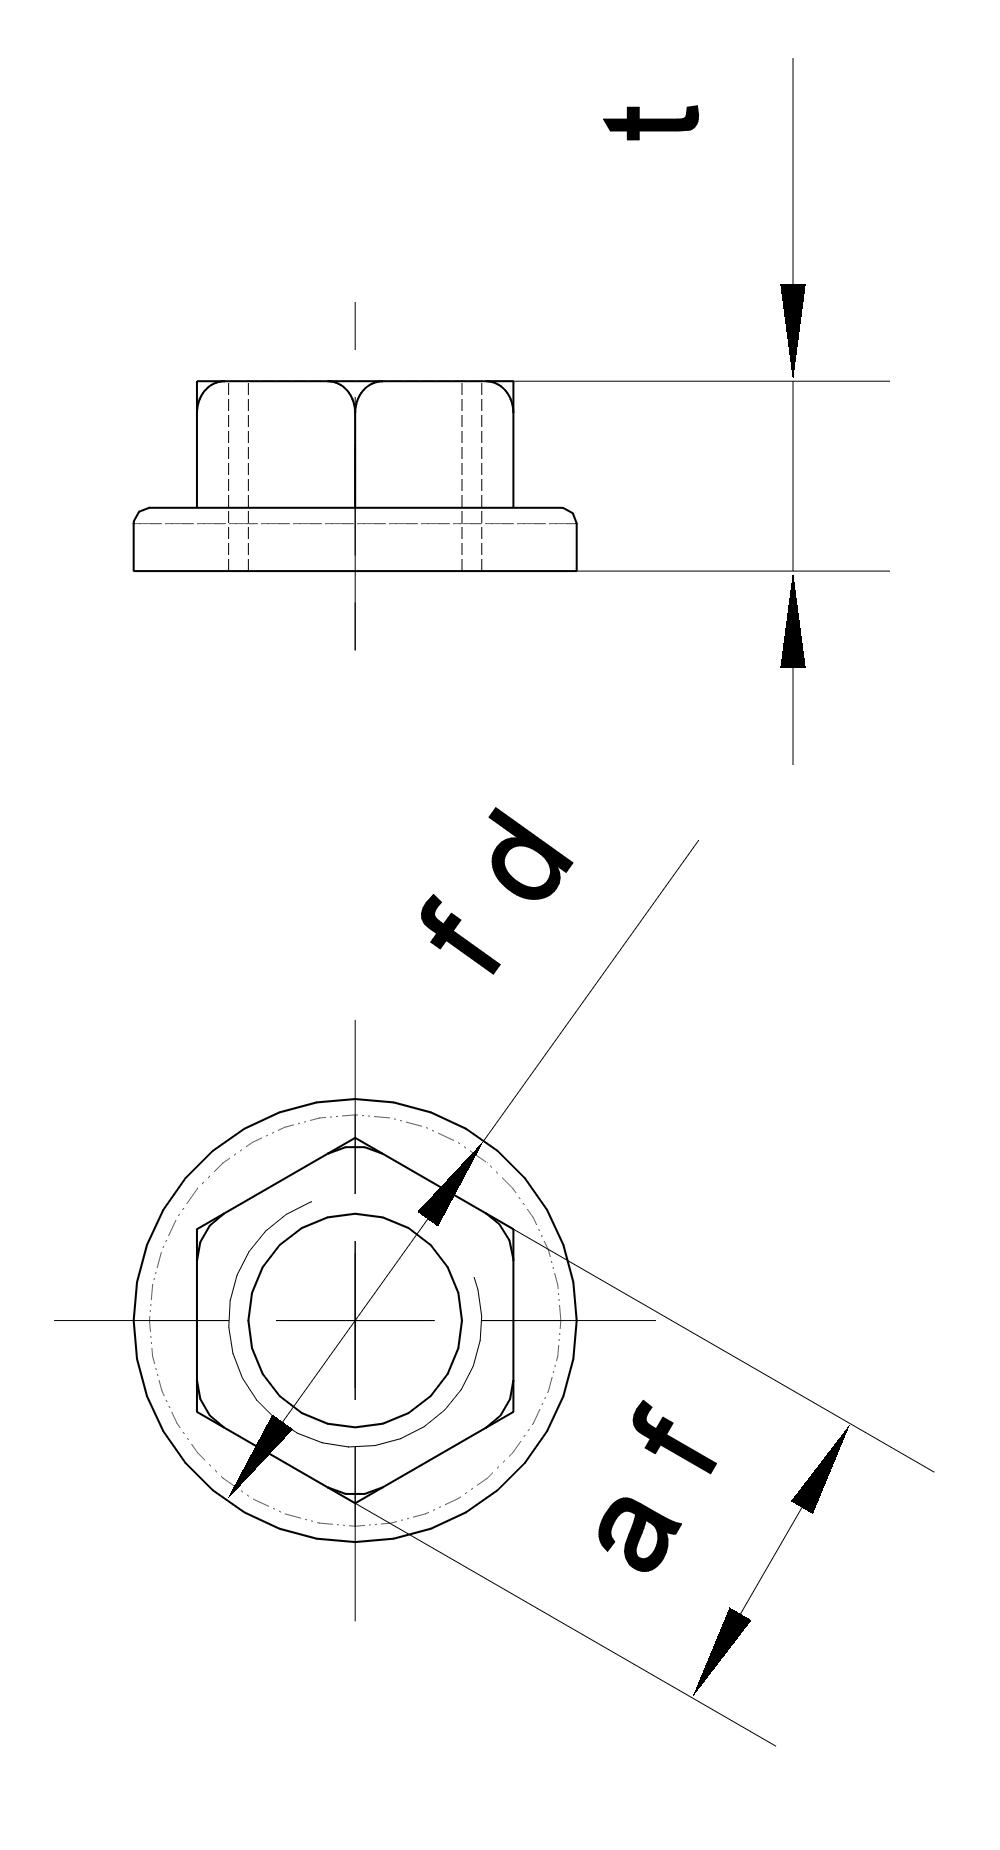 Tuerca-arandela M8